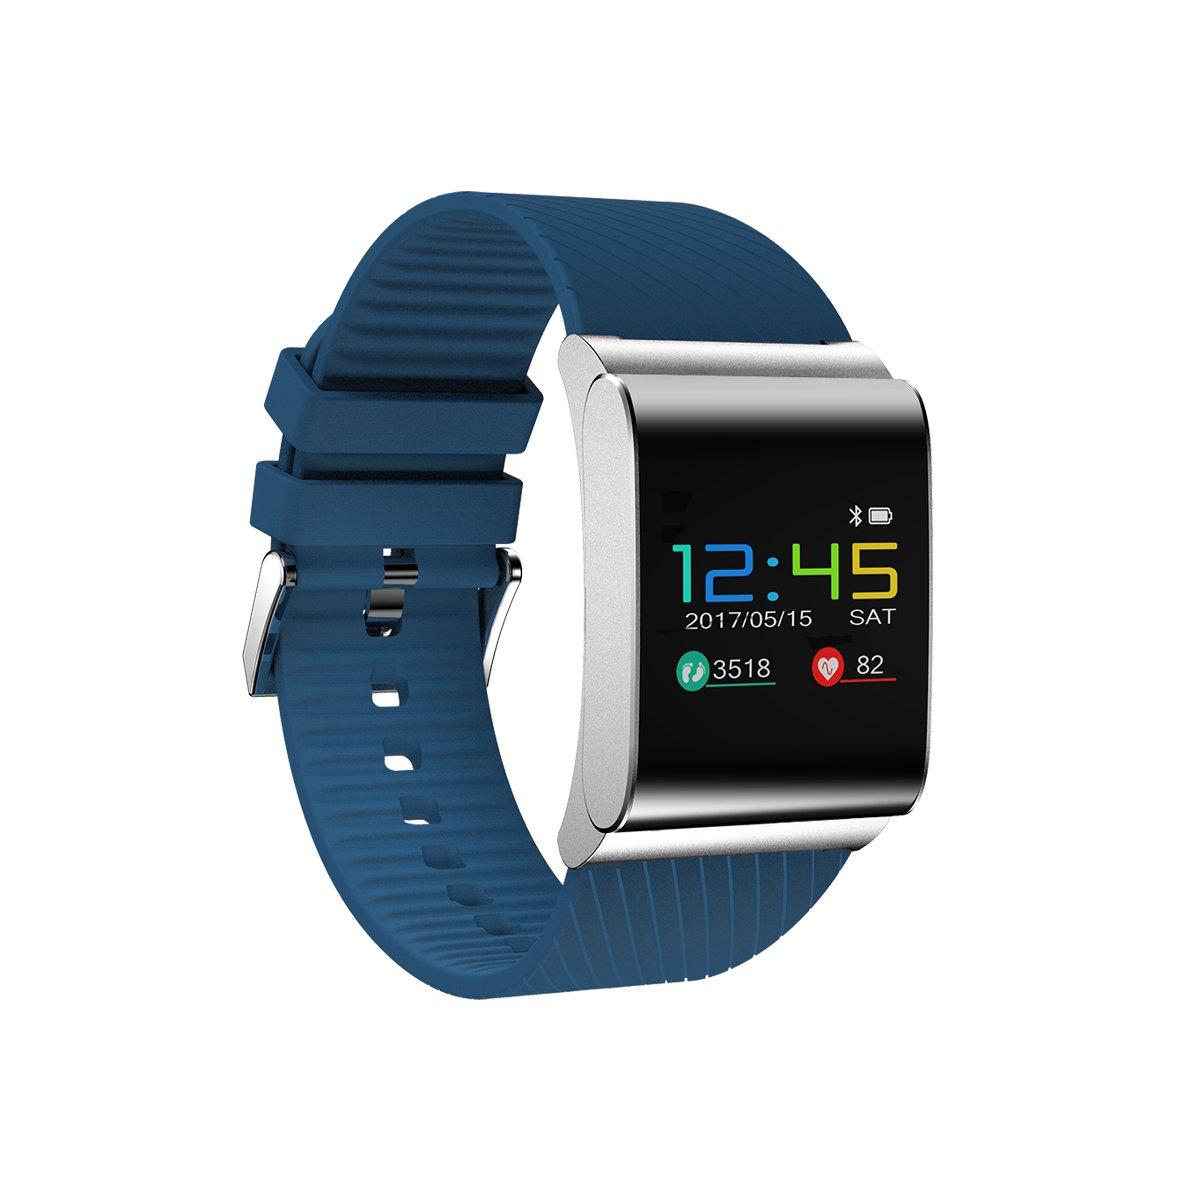 Diggro K18S - Pulsera Inteligente Smartwatch IP65 Cámara alejada ...